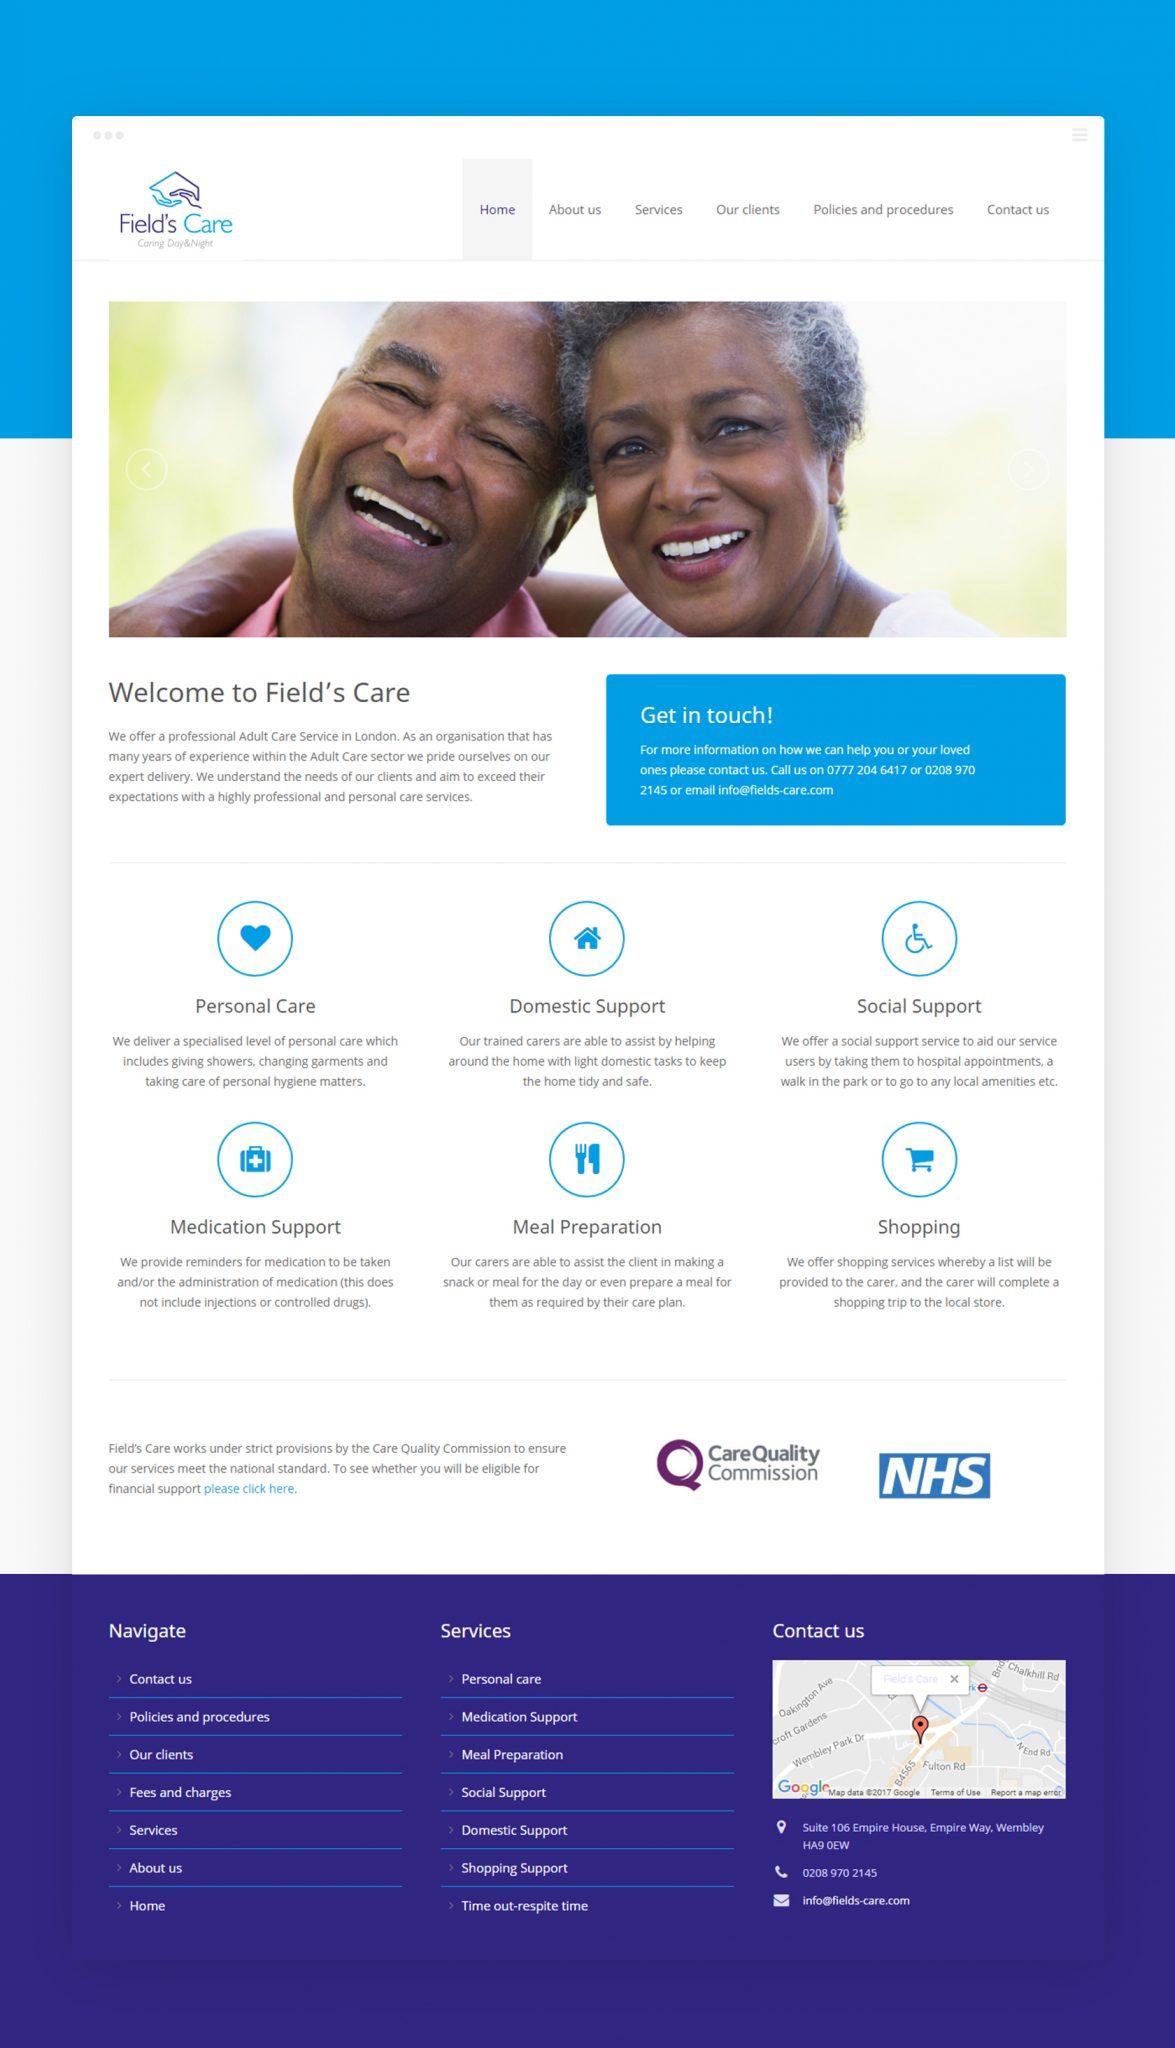 Fields Care Homepage - Fields Care (Website) - Creative Digital